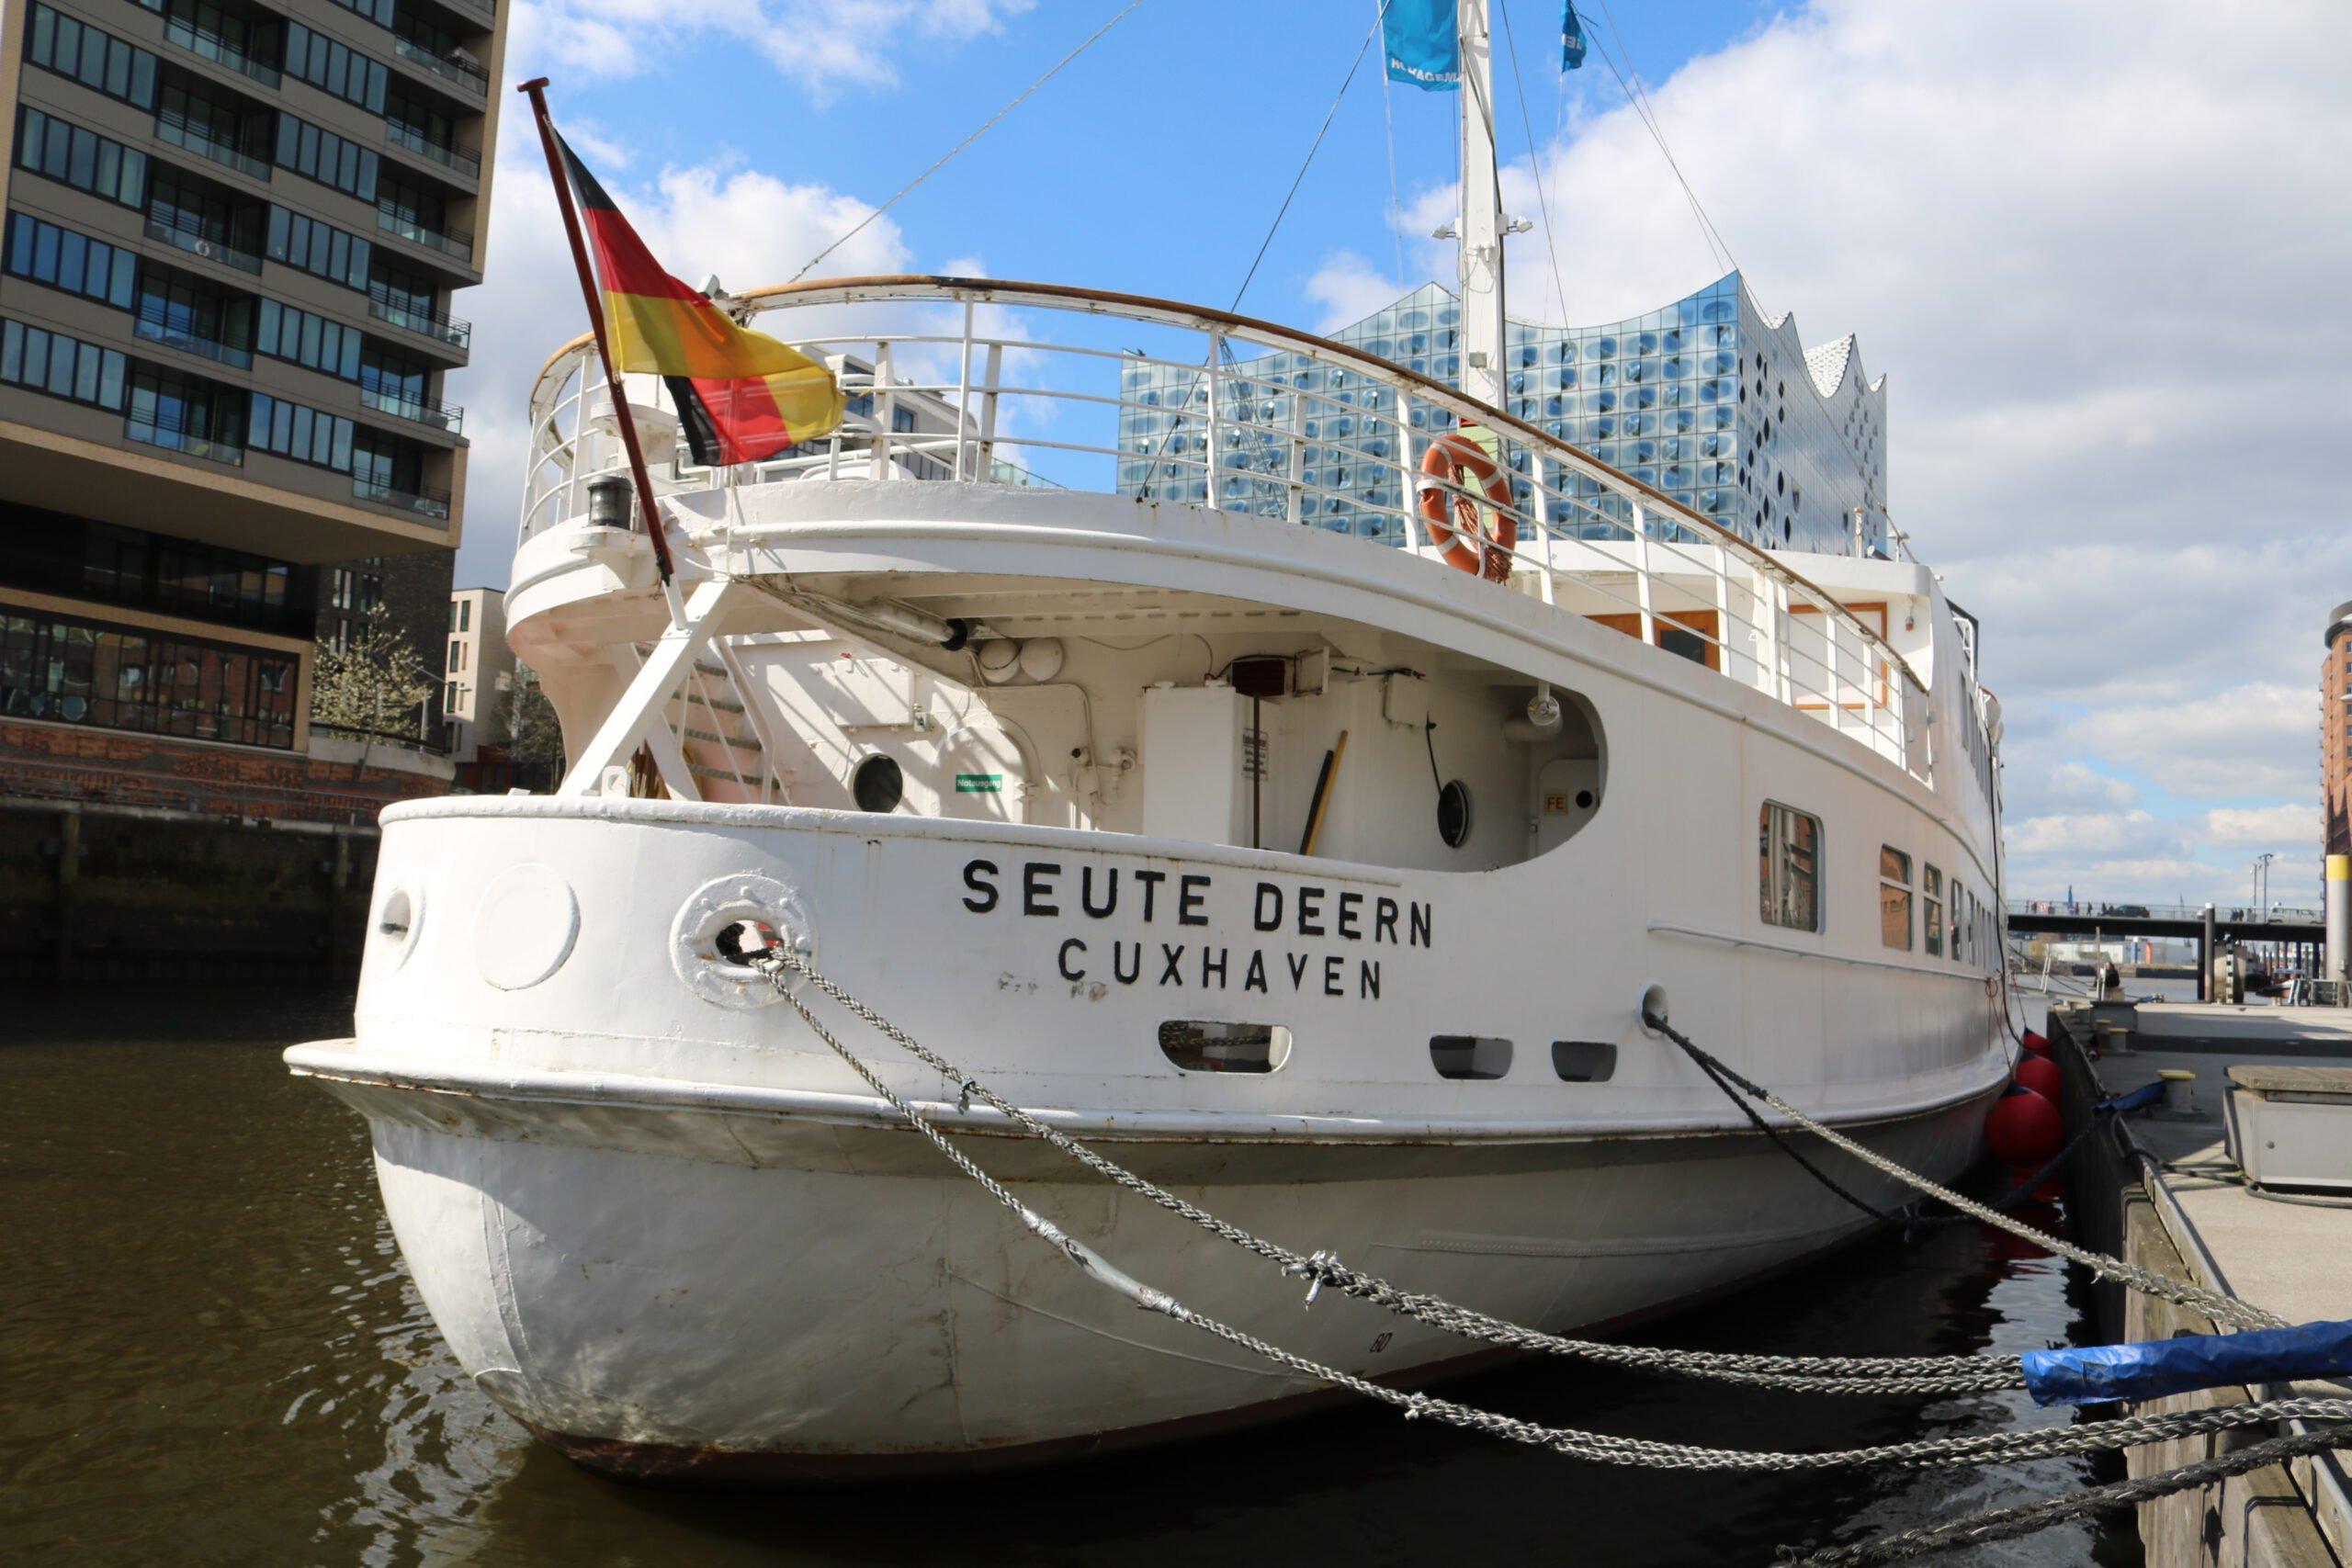 Schiffe in Hamburg: Heute Deern